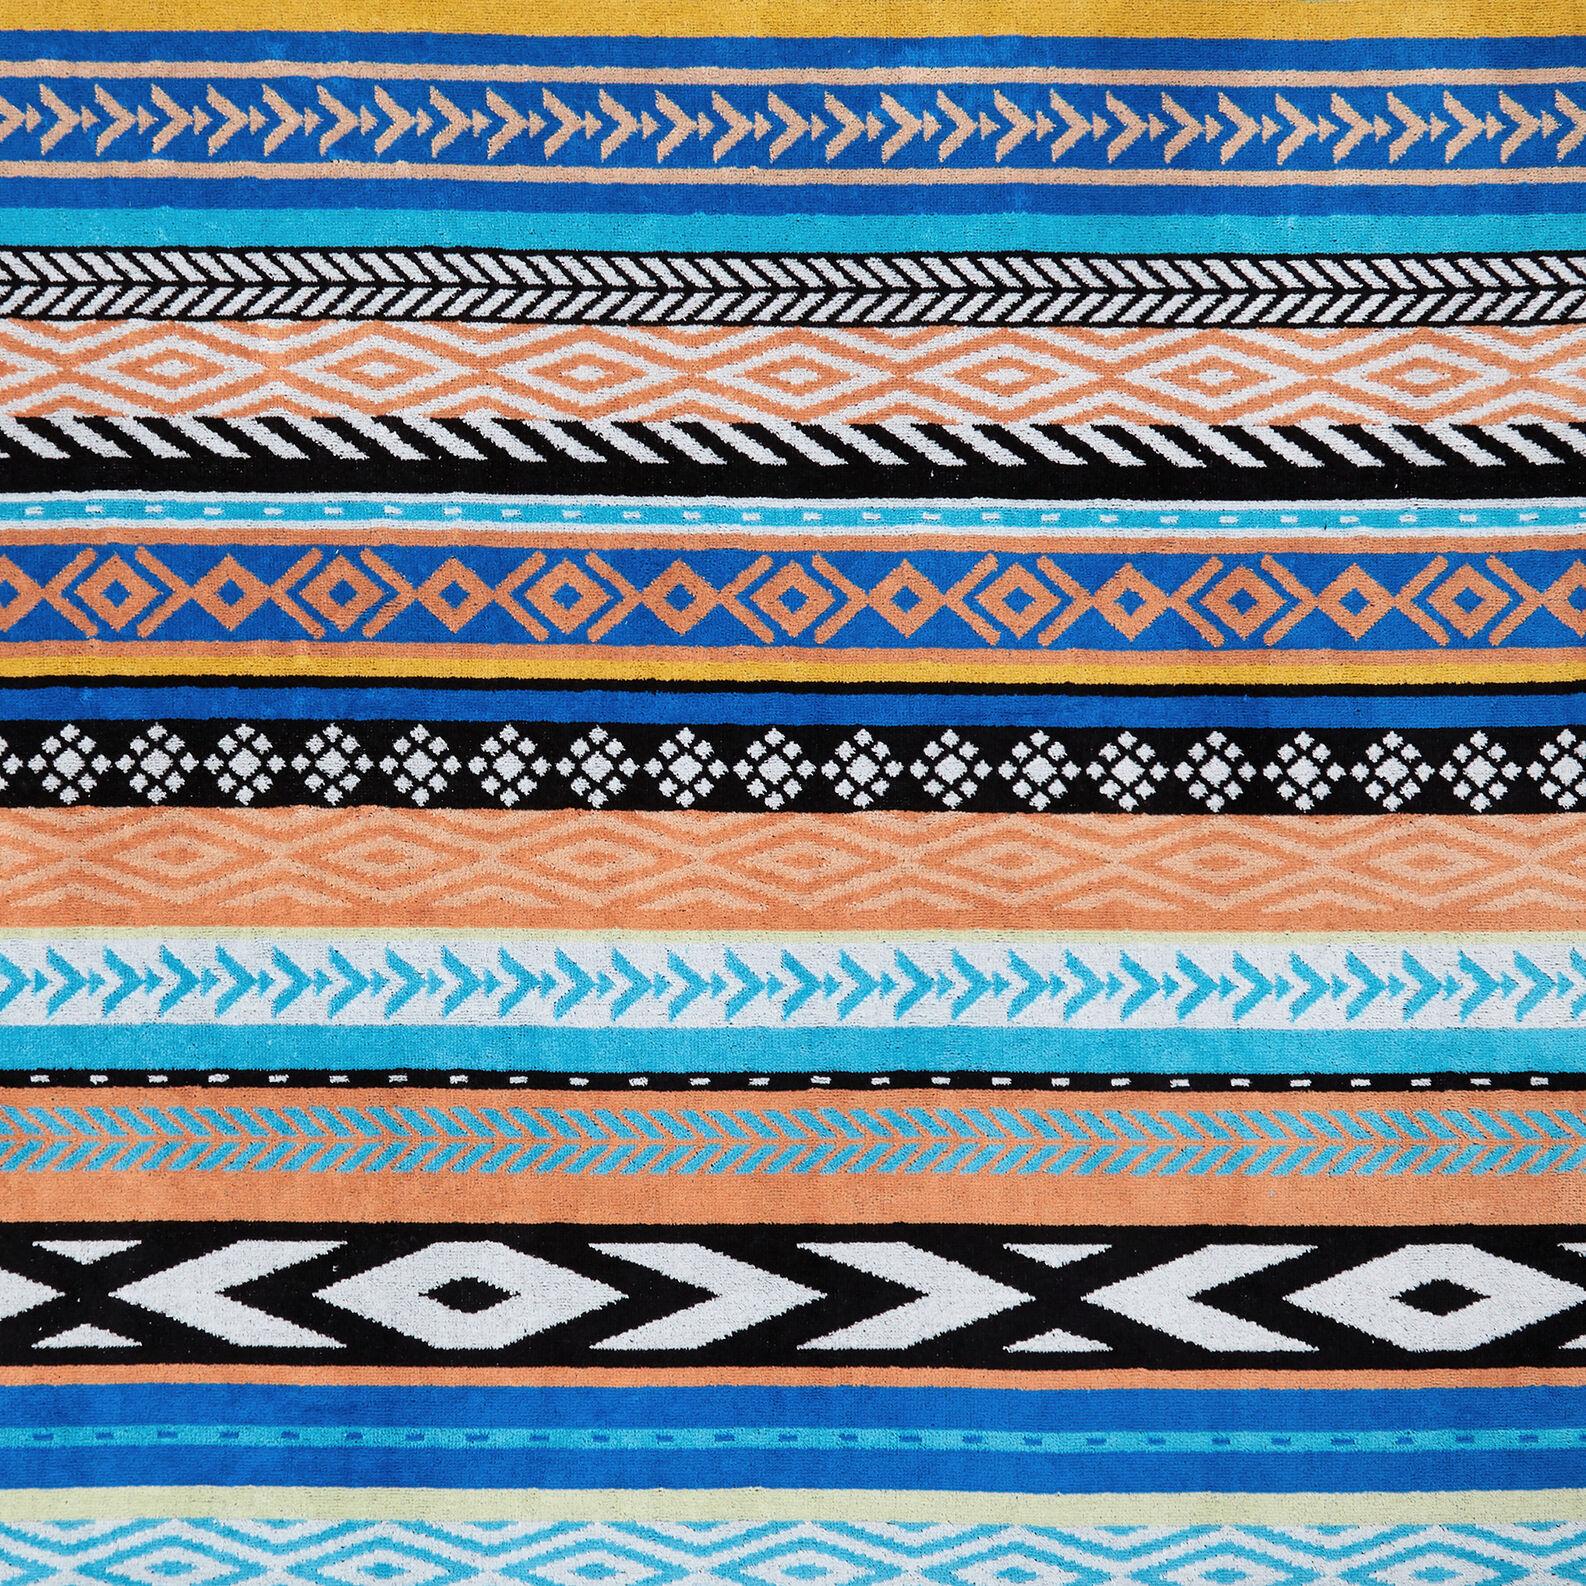 Cotton velor beach towel ethnic motif